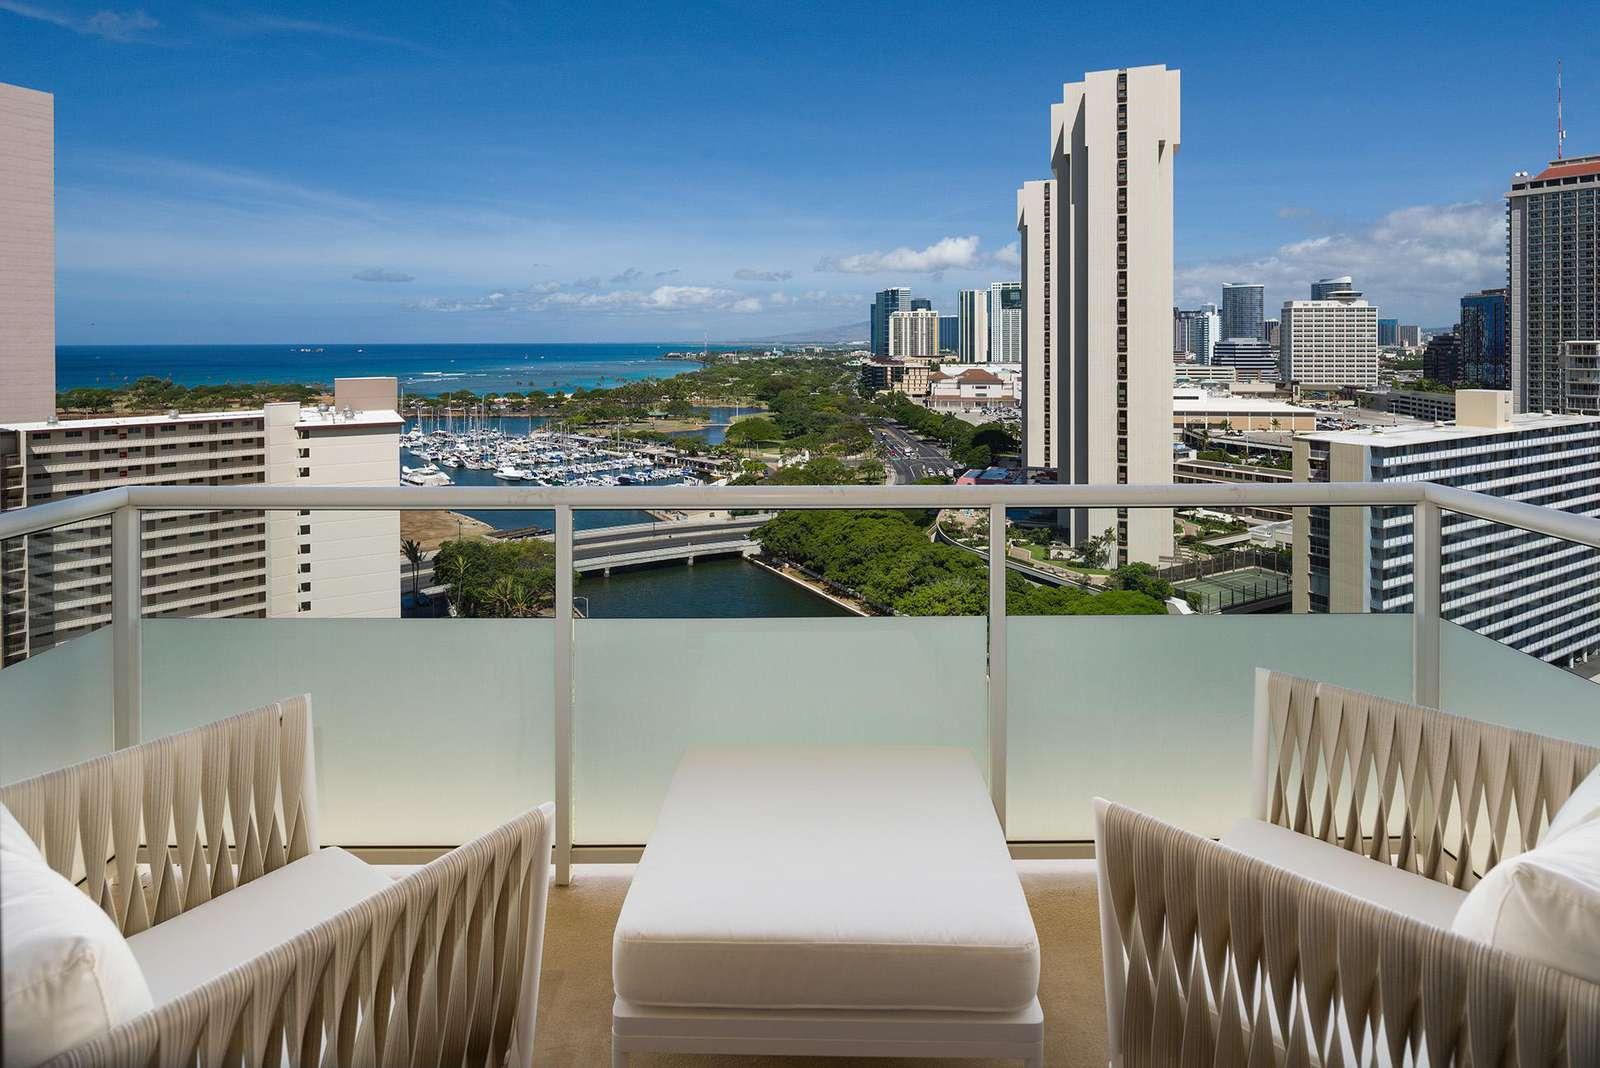 Gorgeous Ocean View 2 bed 2 bath Condo at Watermark Waikiki